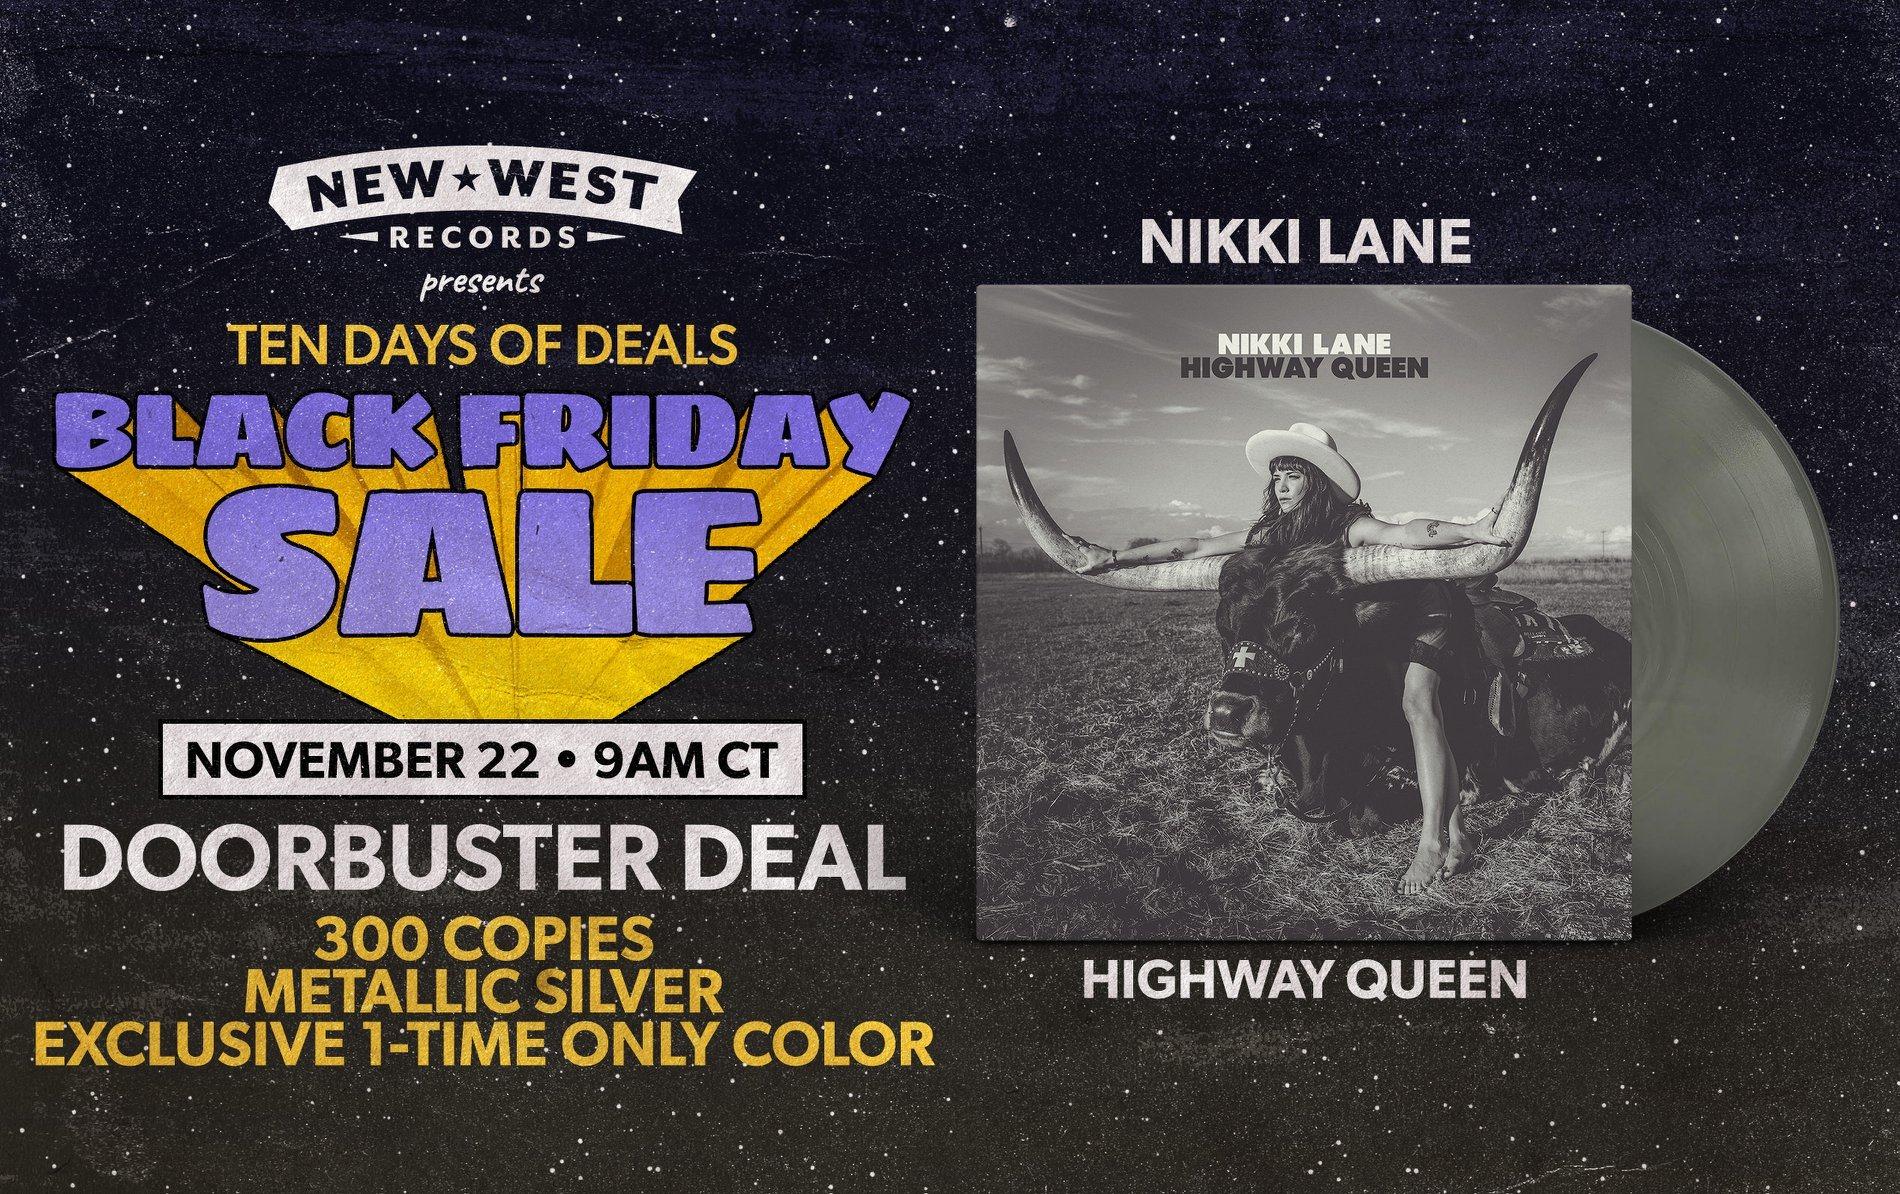 Nikki Lane , la reina de la carretera - Página 9 EncWkPzW4AImMDD?format=jpg&name=large